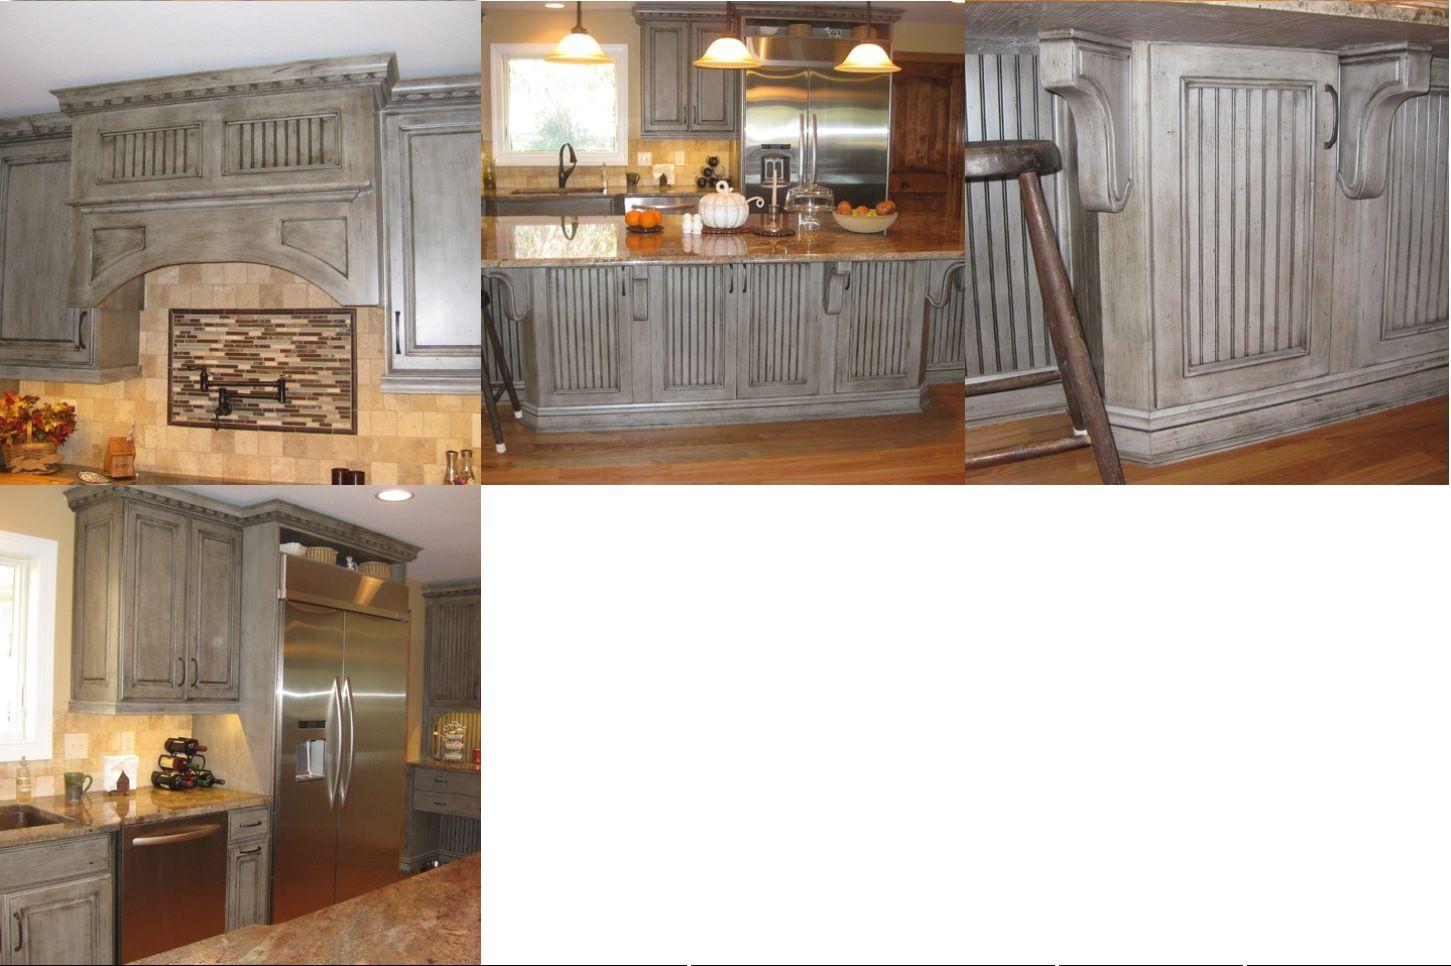 Appaloosa Finish Schuler Cabinets Mixed Style Doors